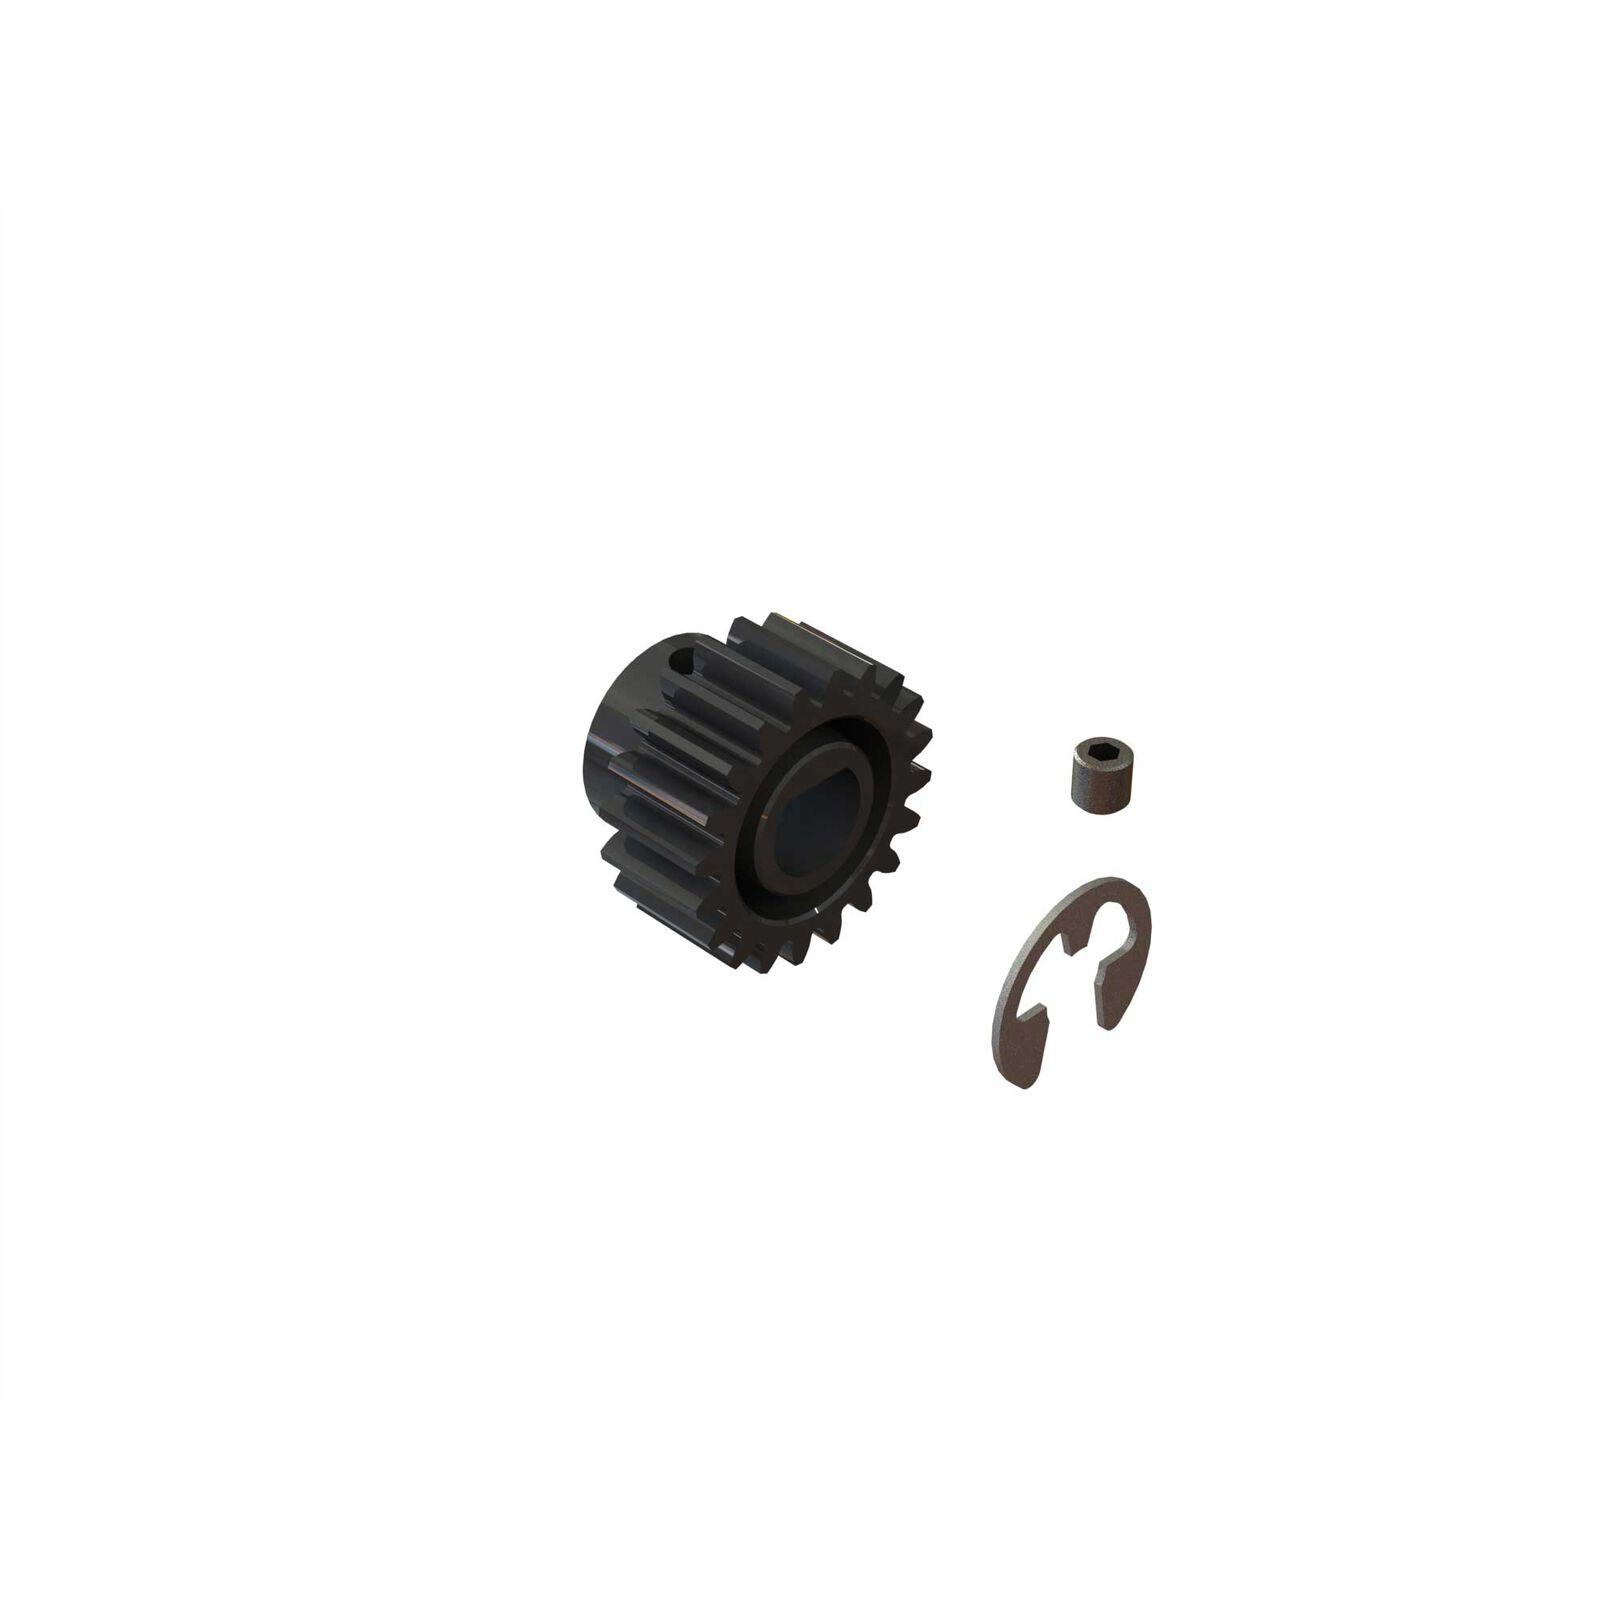 20T Mod1 Safe-D8 Pinion Gear